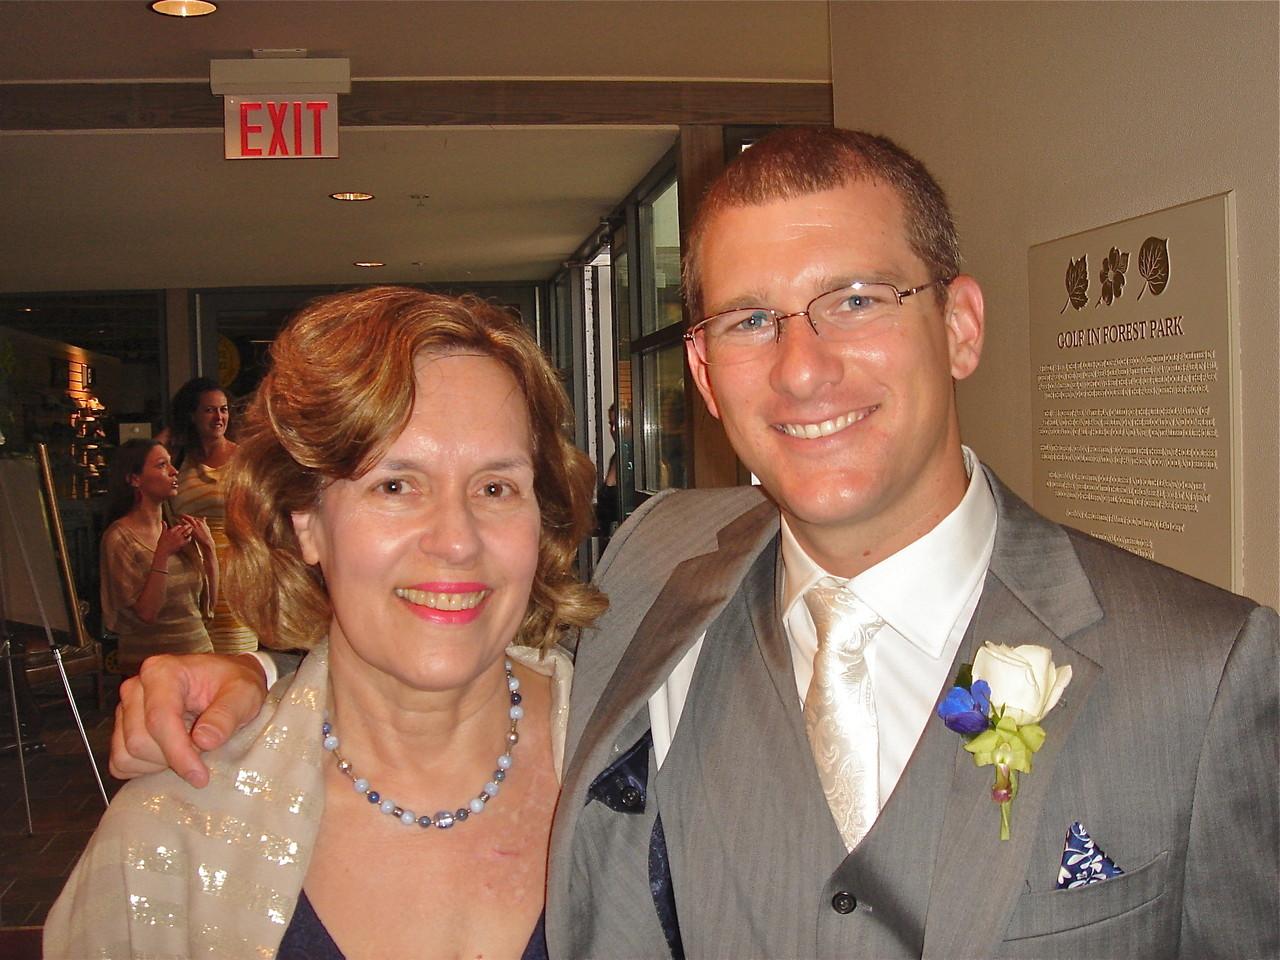 Lorraine Gudas & Corey Farabi, the groom